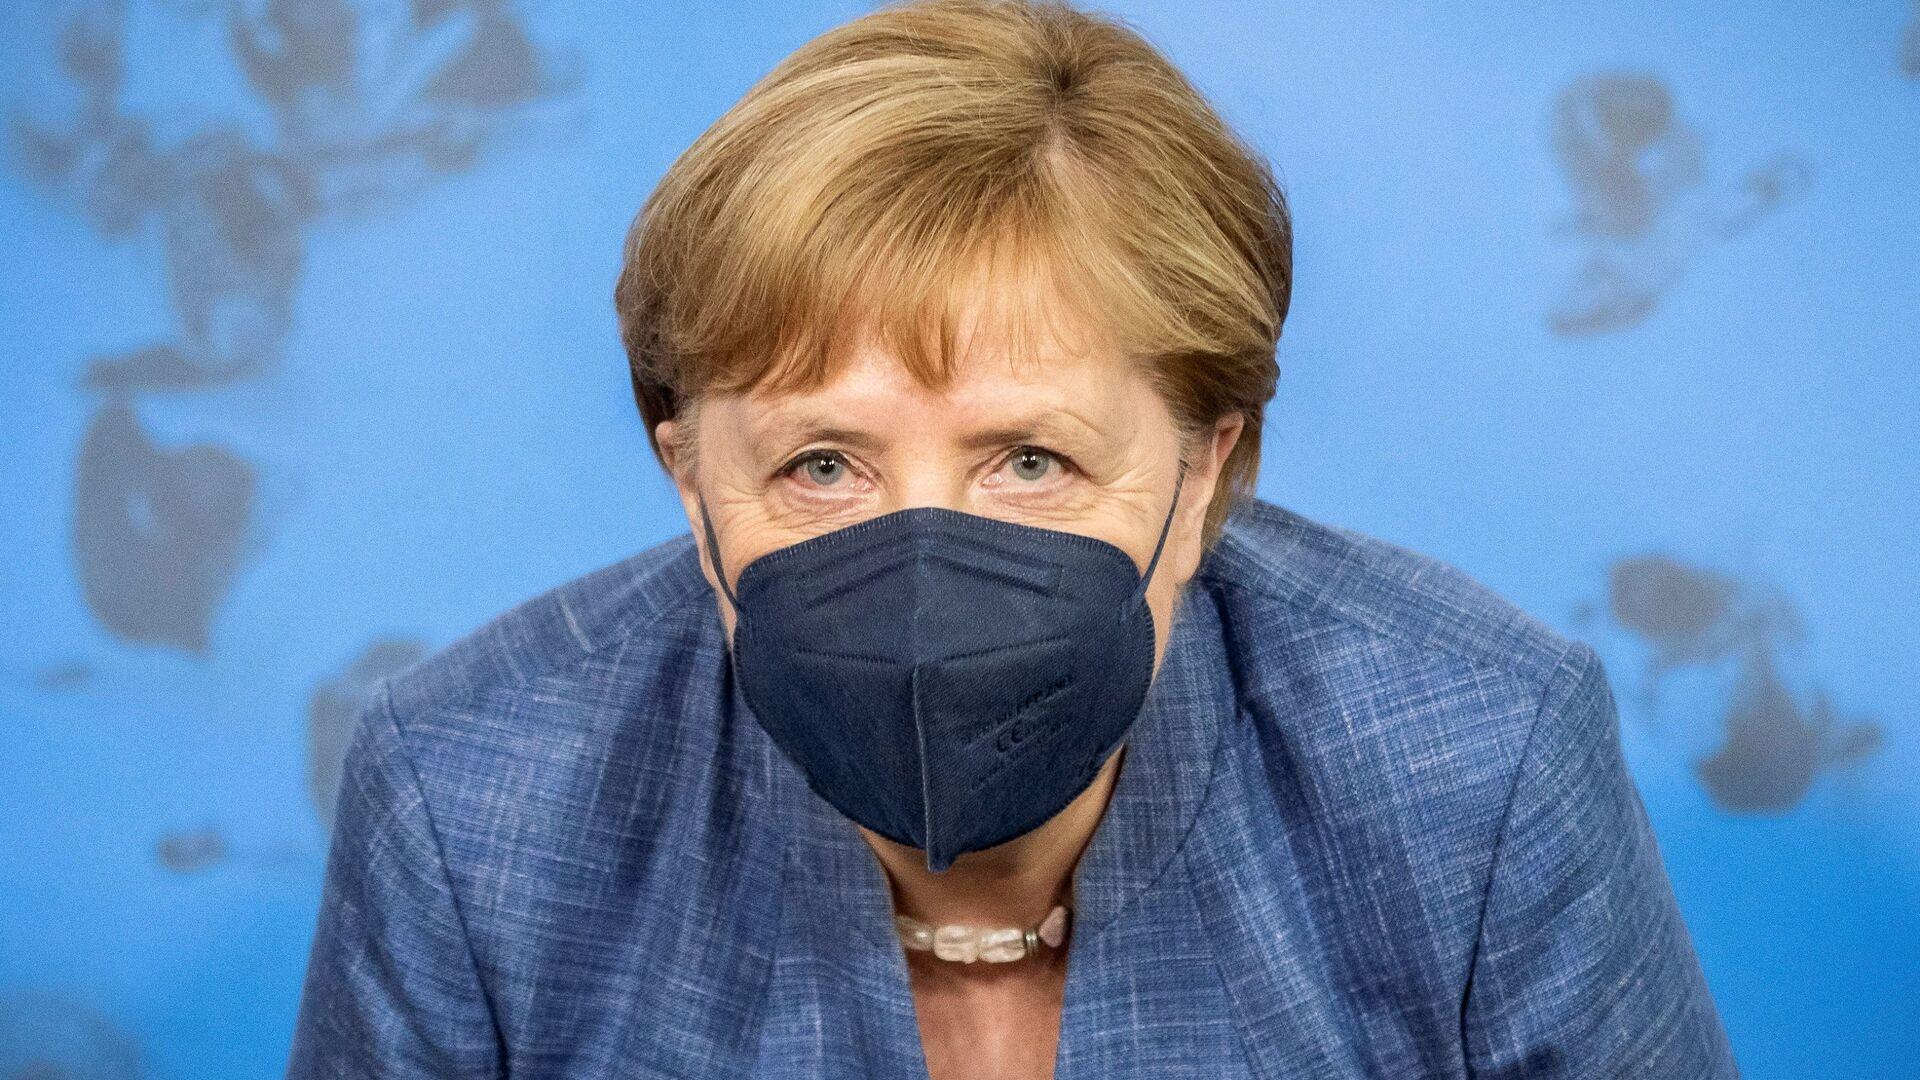 Kancléřka SRN Angela Merkelová - Sputnik Česká republika, 1920, 22.07.2021